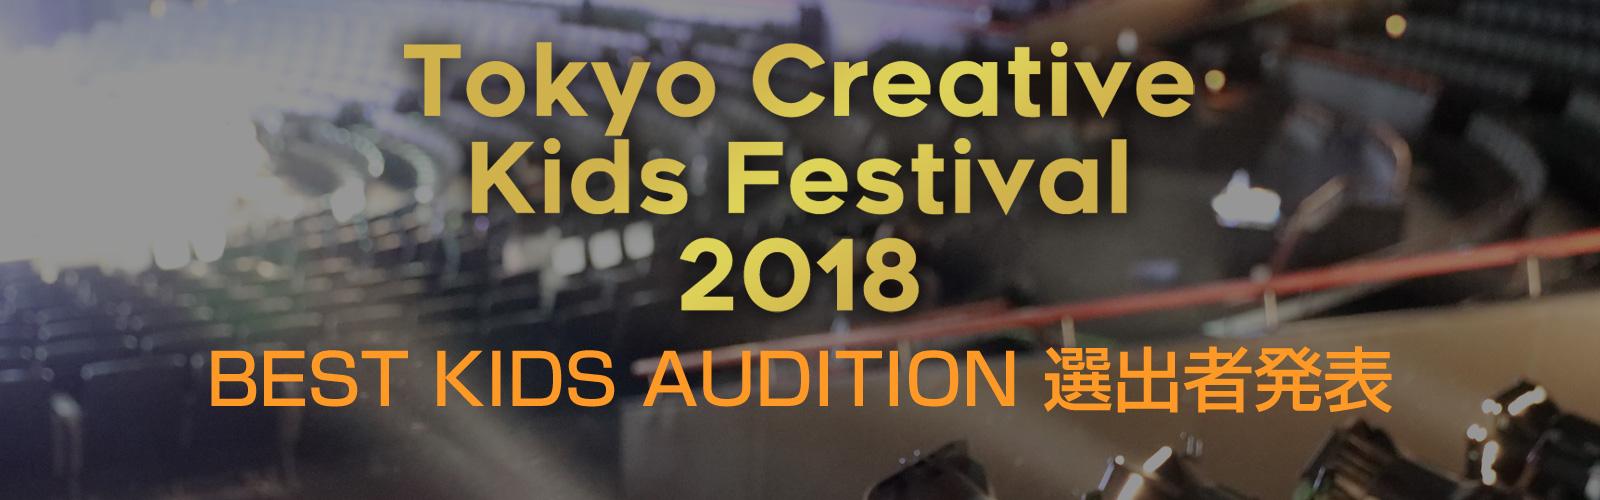 Tokyo Creative Kids Festival 2018選出者発表